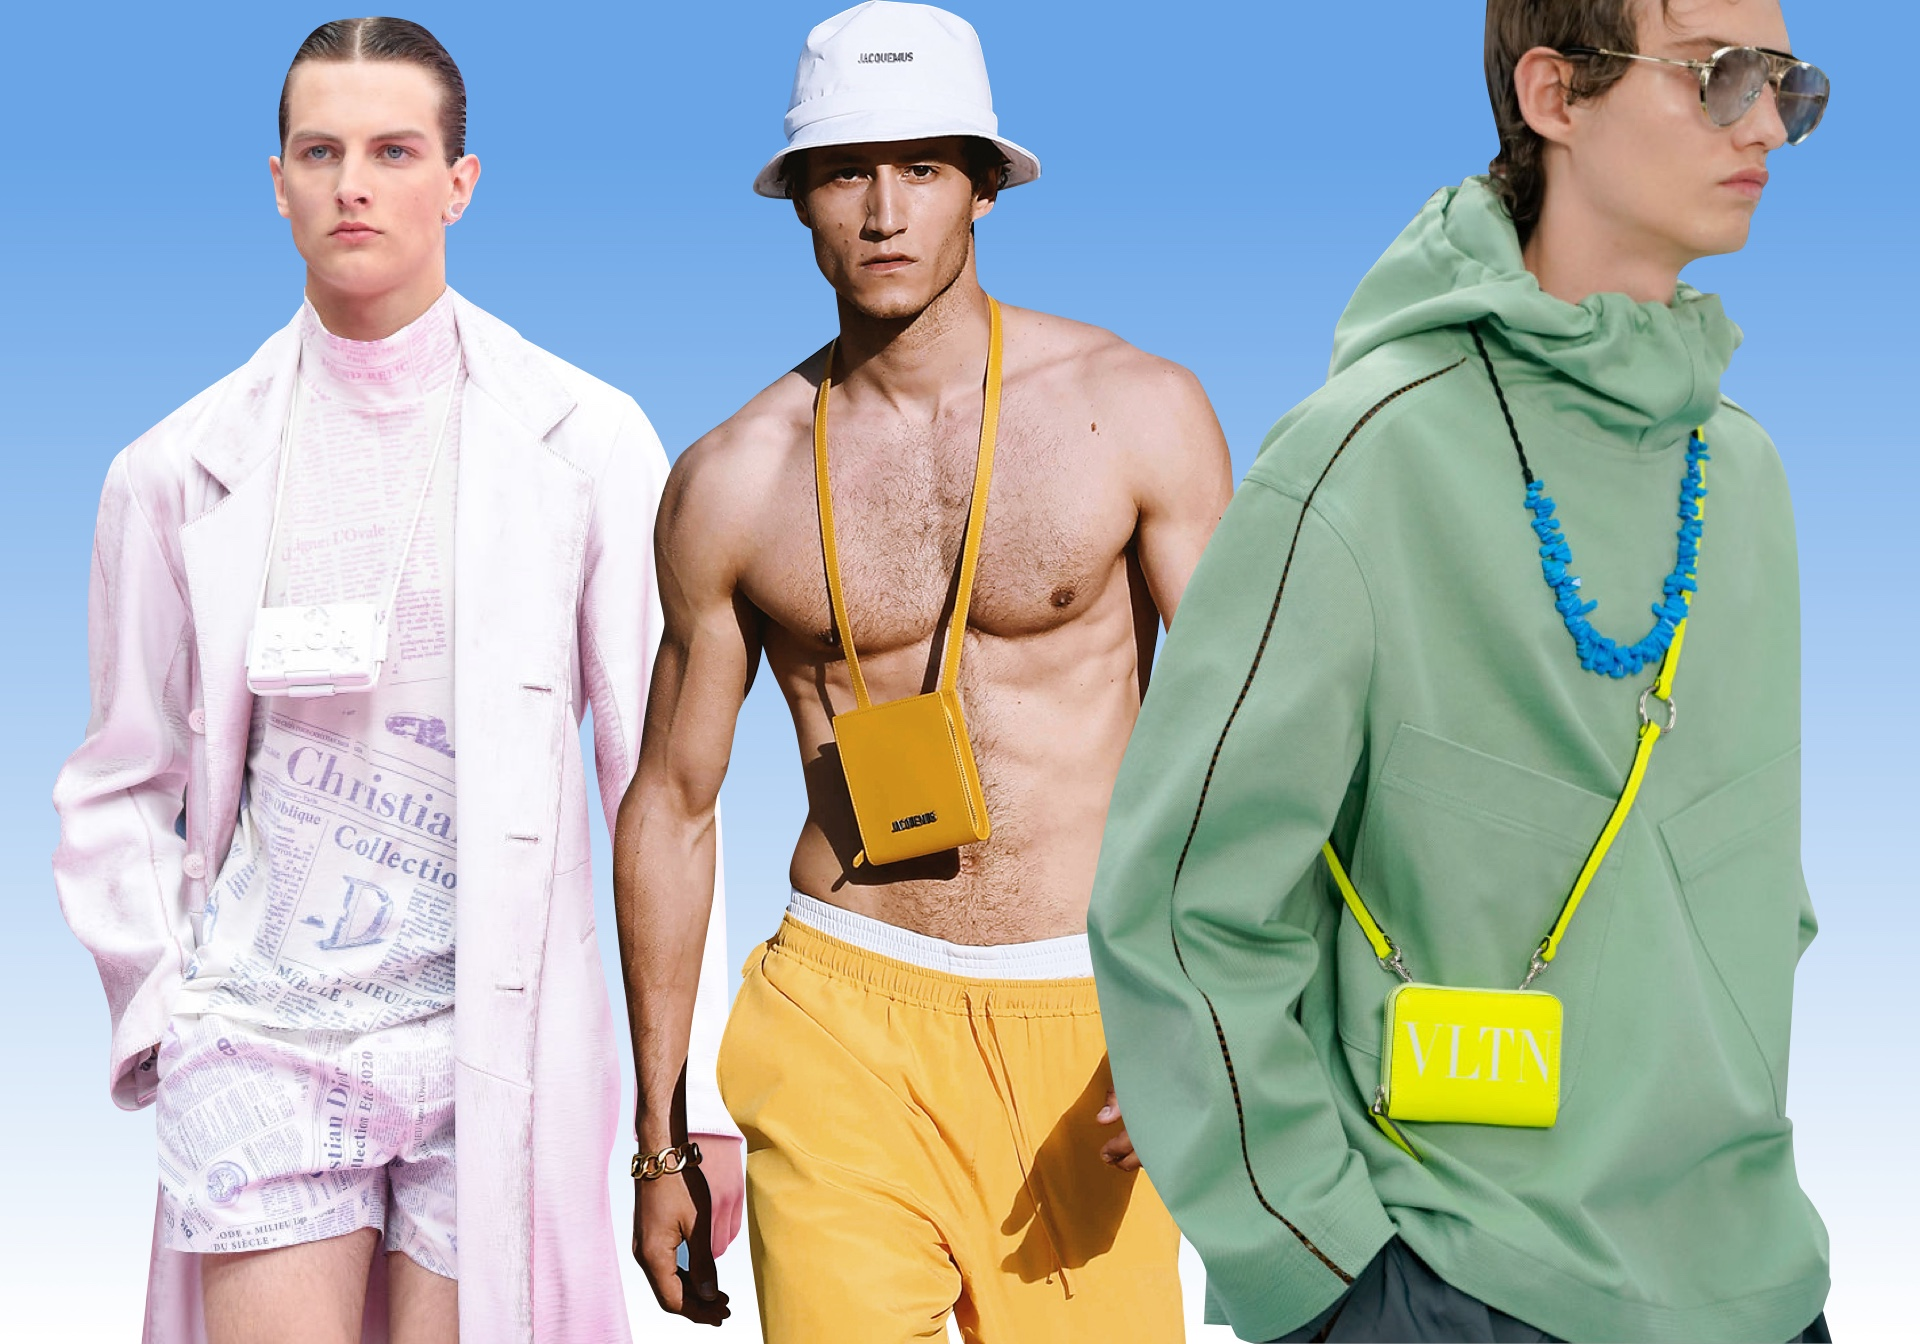 Dior Homme весна-лето 2020, Jacquemus Homme весна-лето 2019, Valentino menswear весна-лето 2020